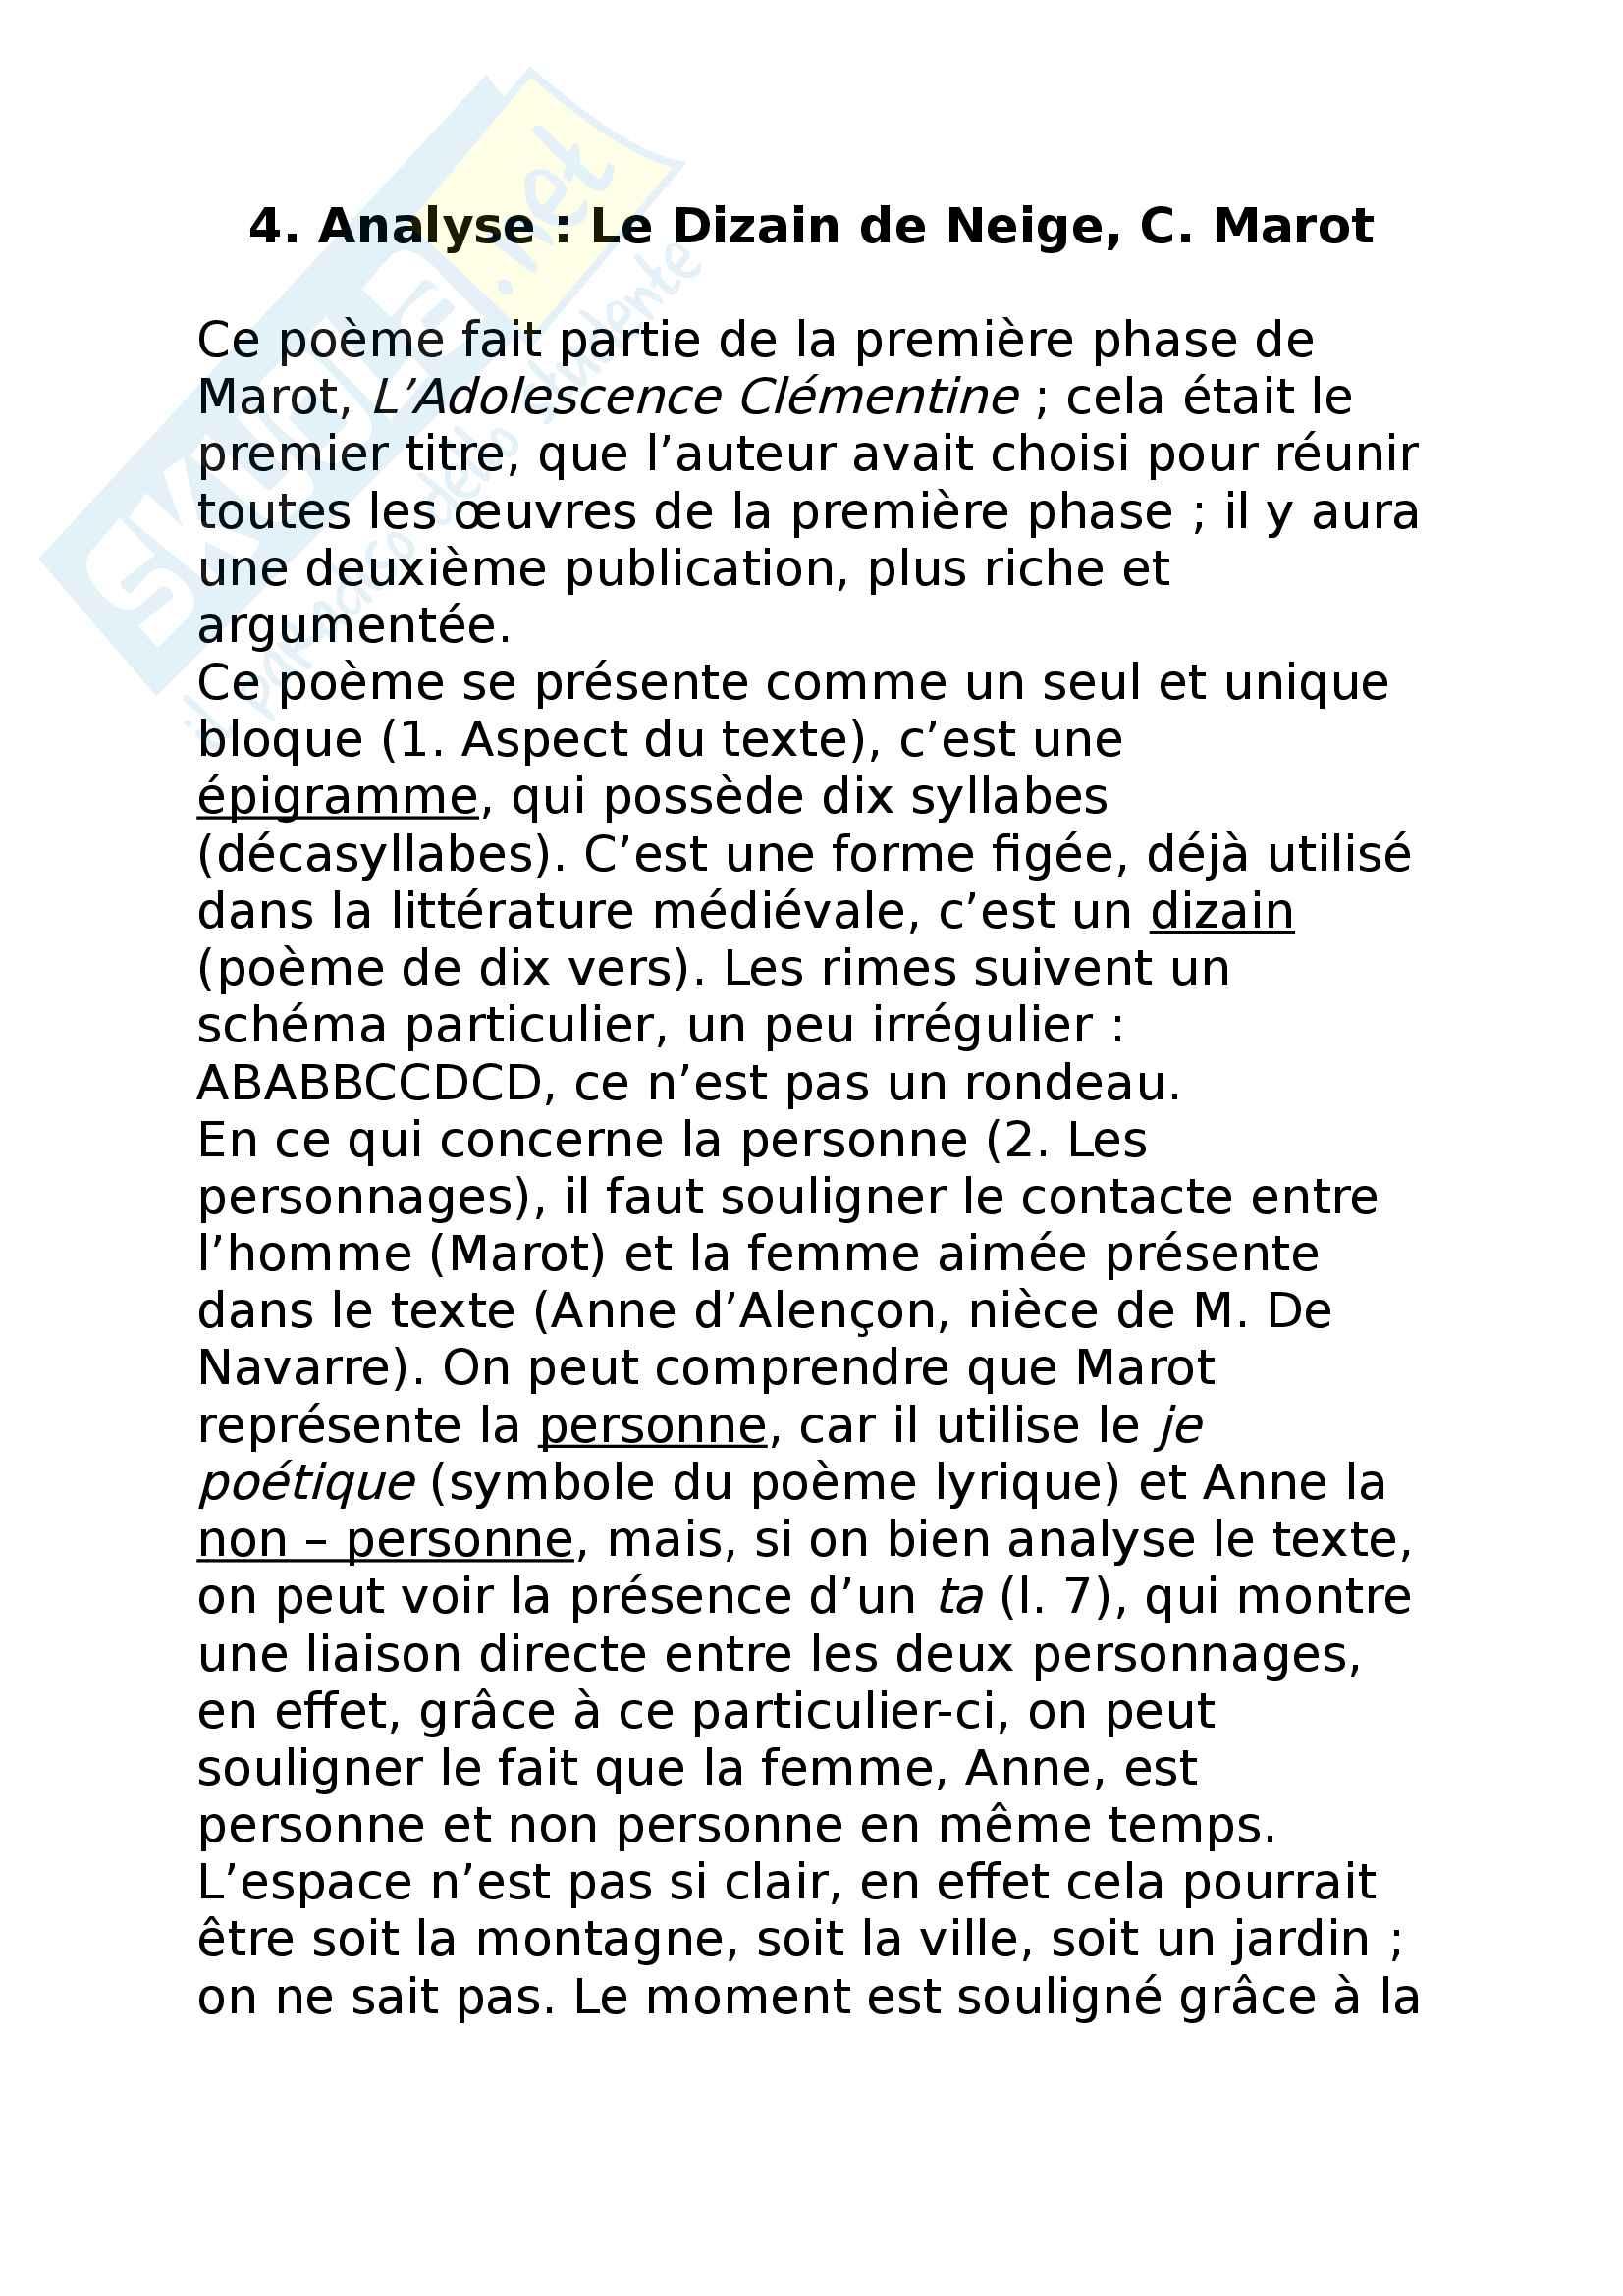 4. Analyse - Le Dizain de Neige, C. Marot